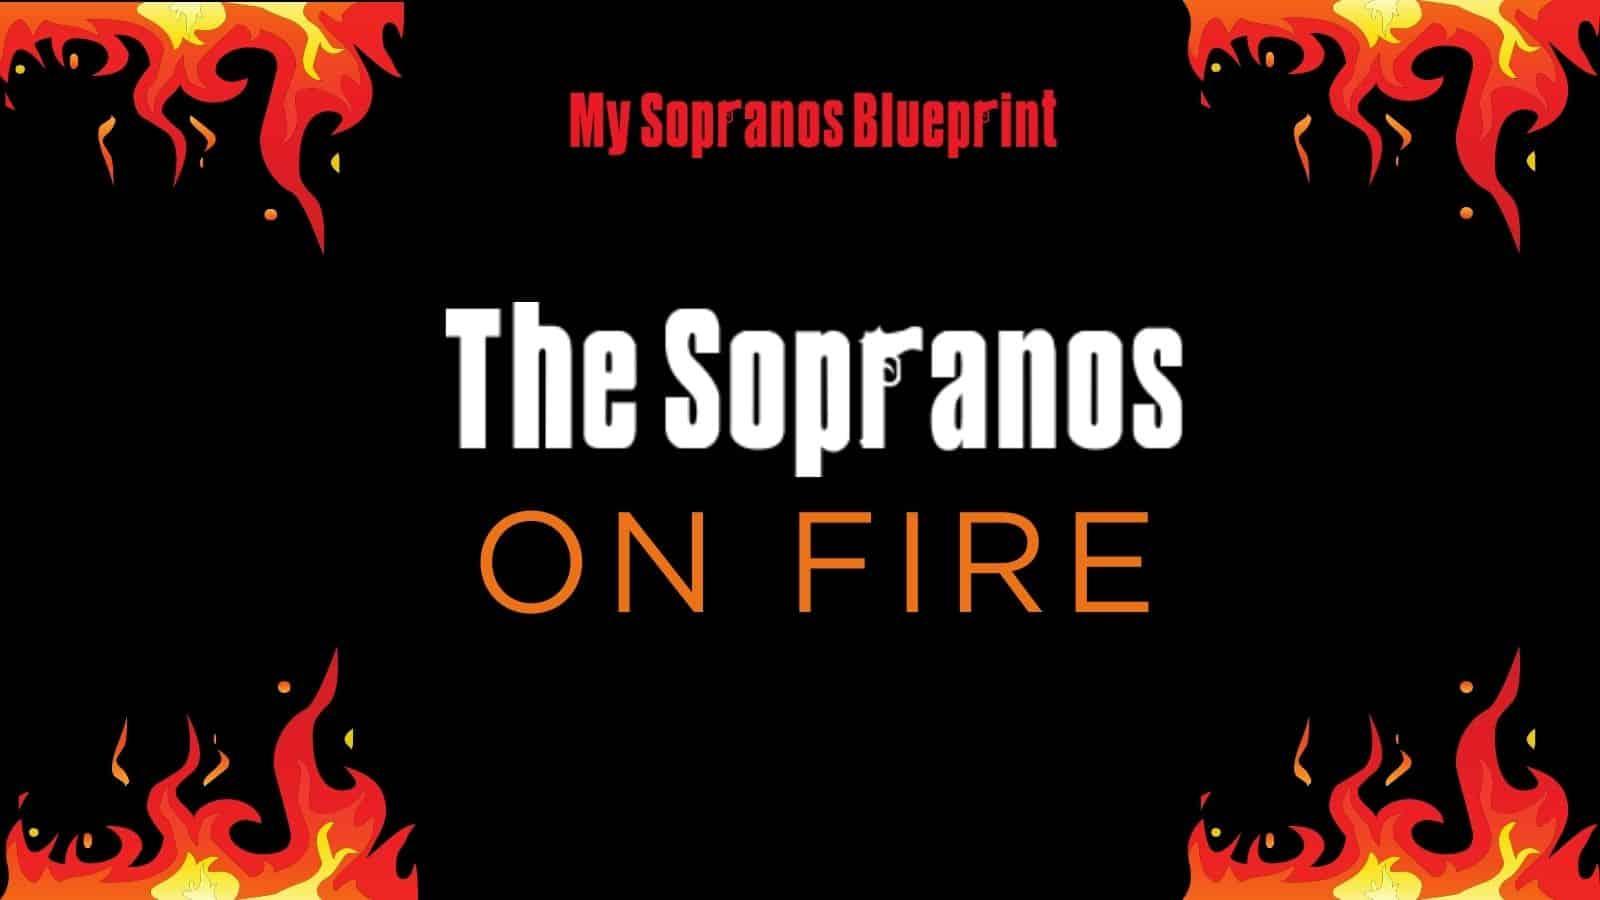 the sopranos fire cover image